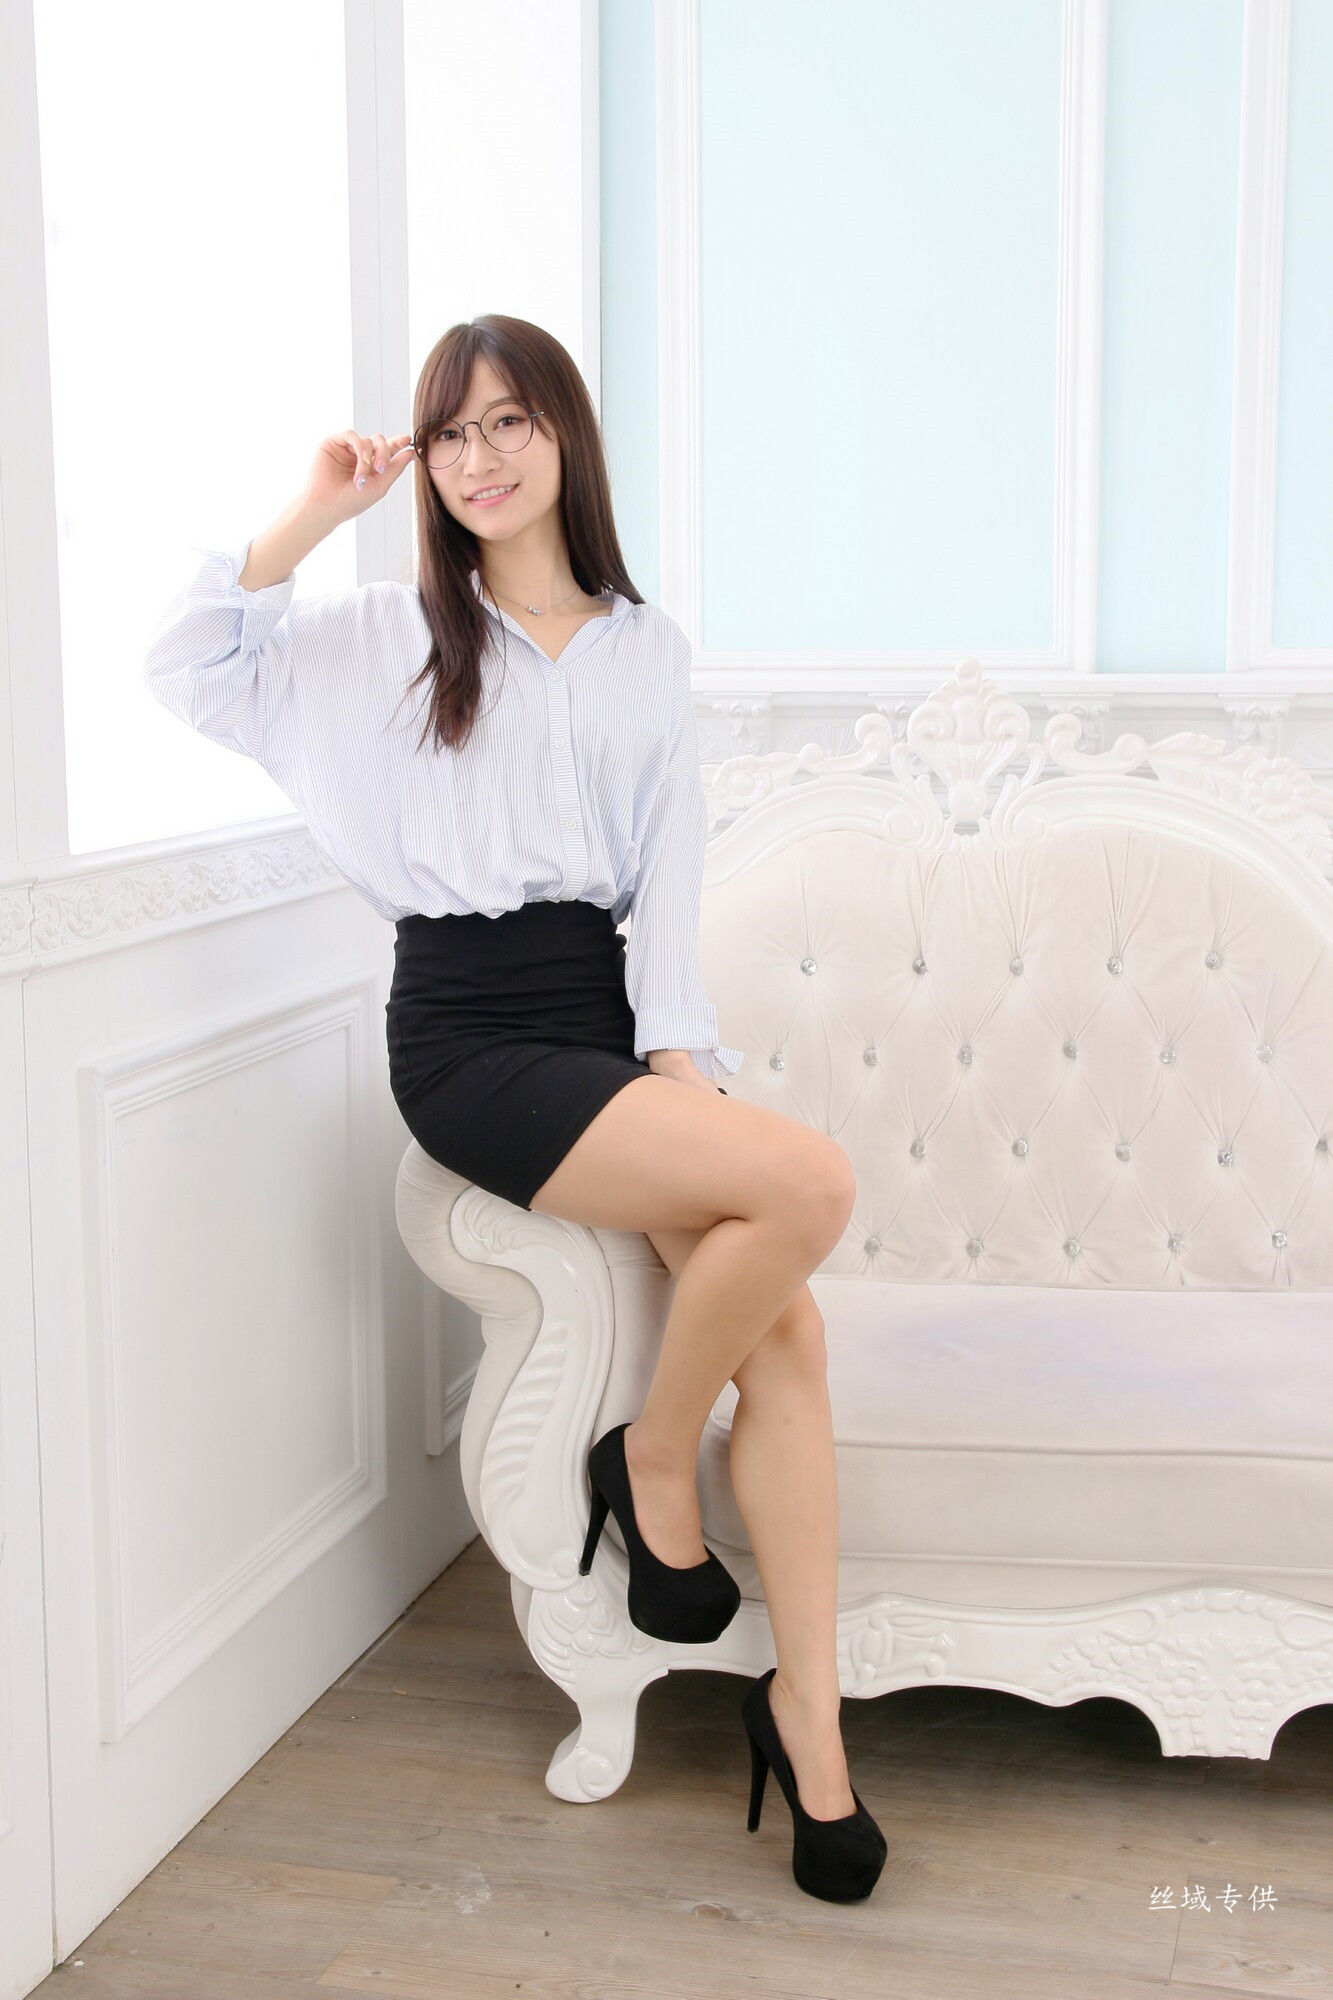 VOL.232 [台湾正妹]美腿OL美女:张雅筑(腿模Chu,张小筑)超高清个人性感漂亮大图(48P)